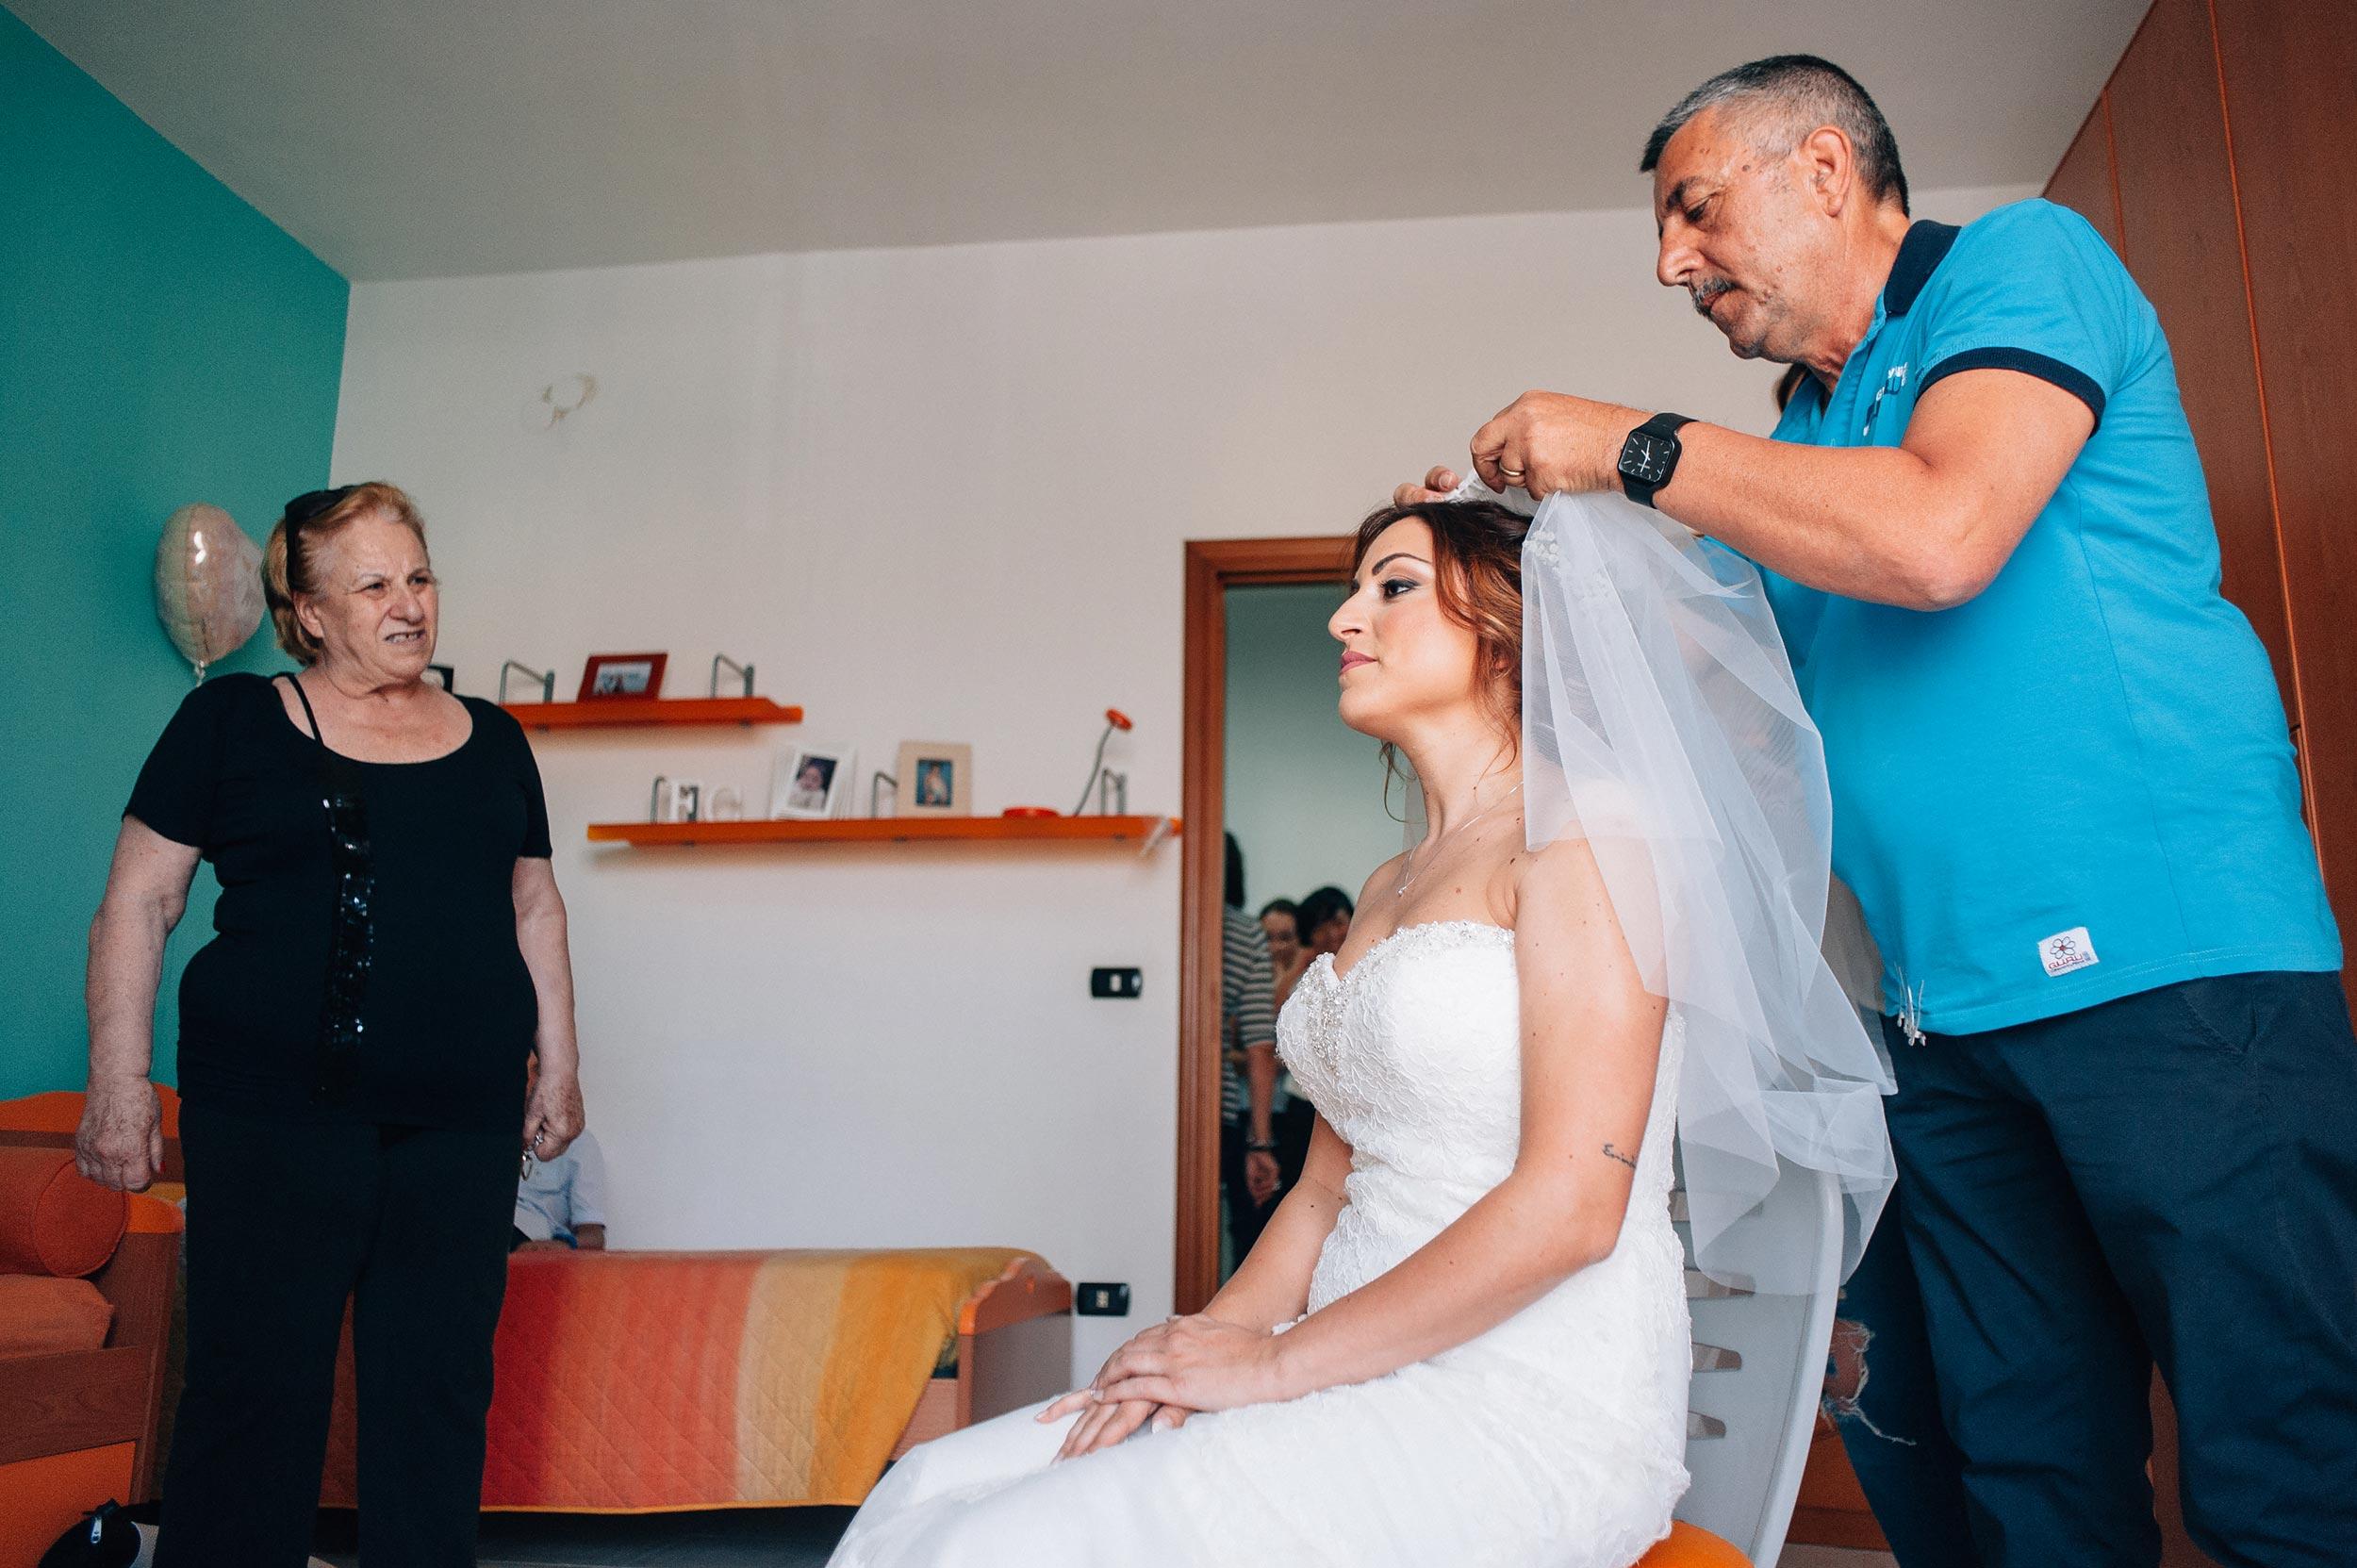 2016-Claudio-Teresa-Naples-Wedding-Photographer-Italy-Alessandro-Avenali-32.jpg